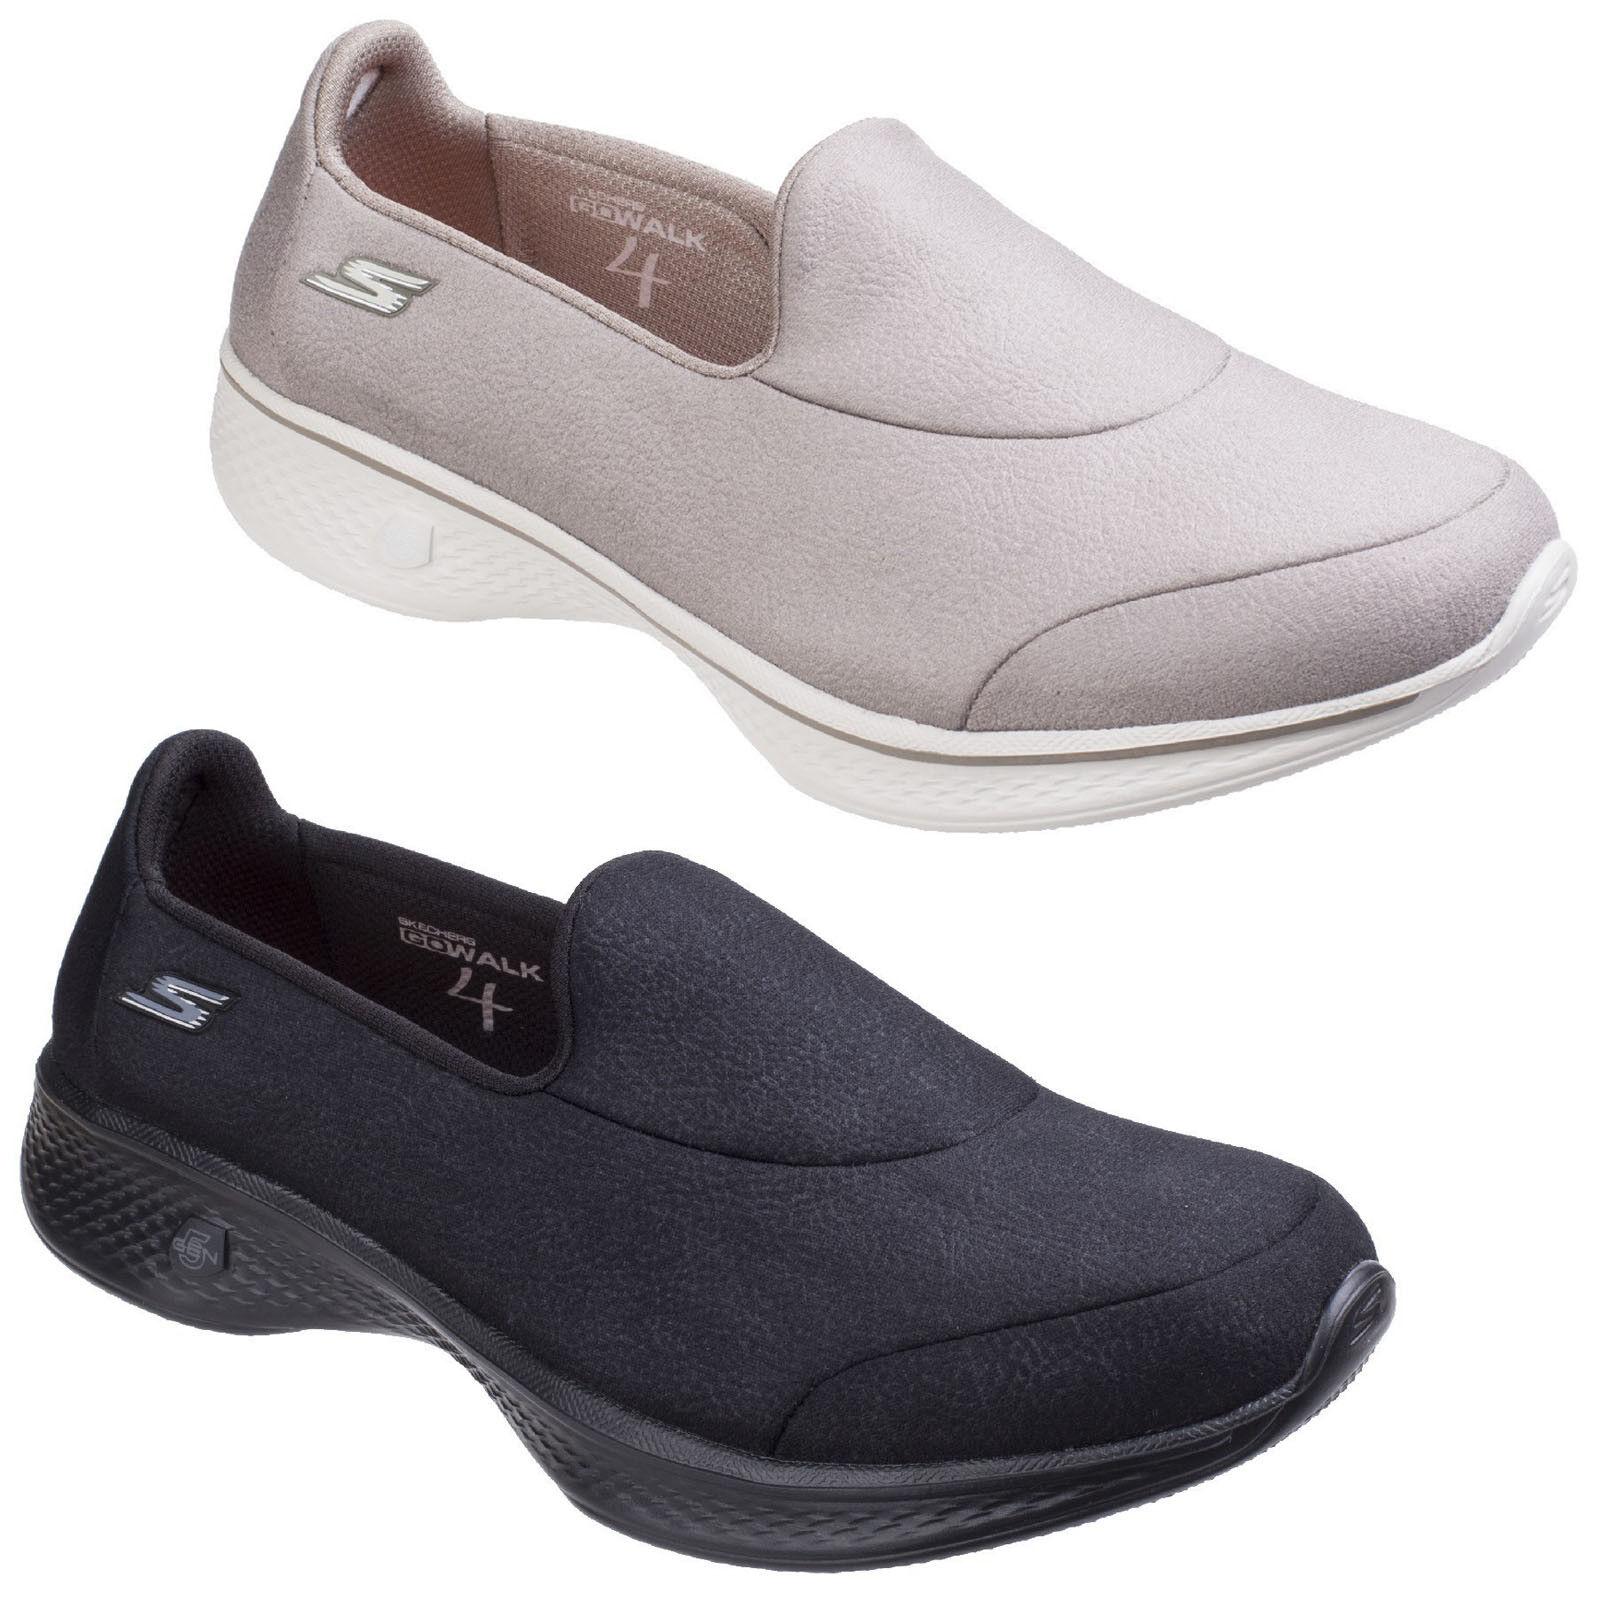 Skechers Go Walk 4 Inspire Trainers Damenschuhe Memory Foam Fashion Sports Schuhes